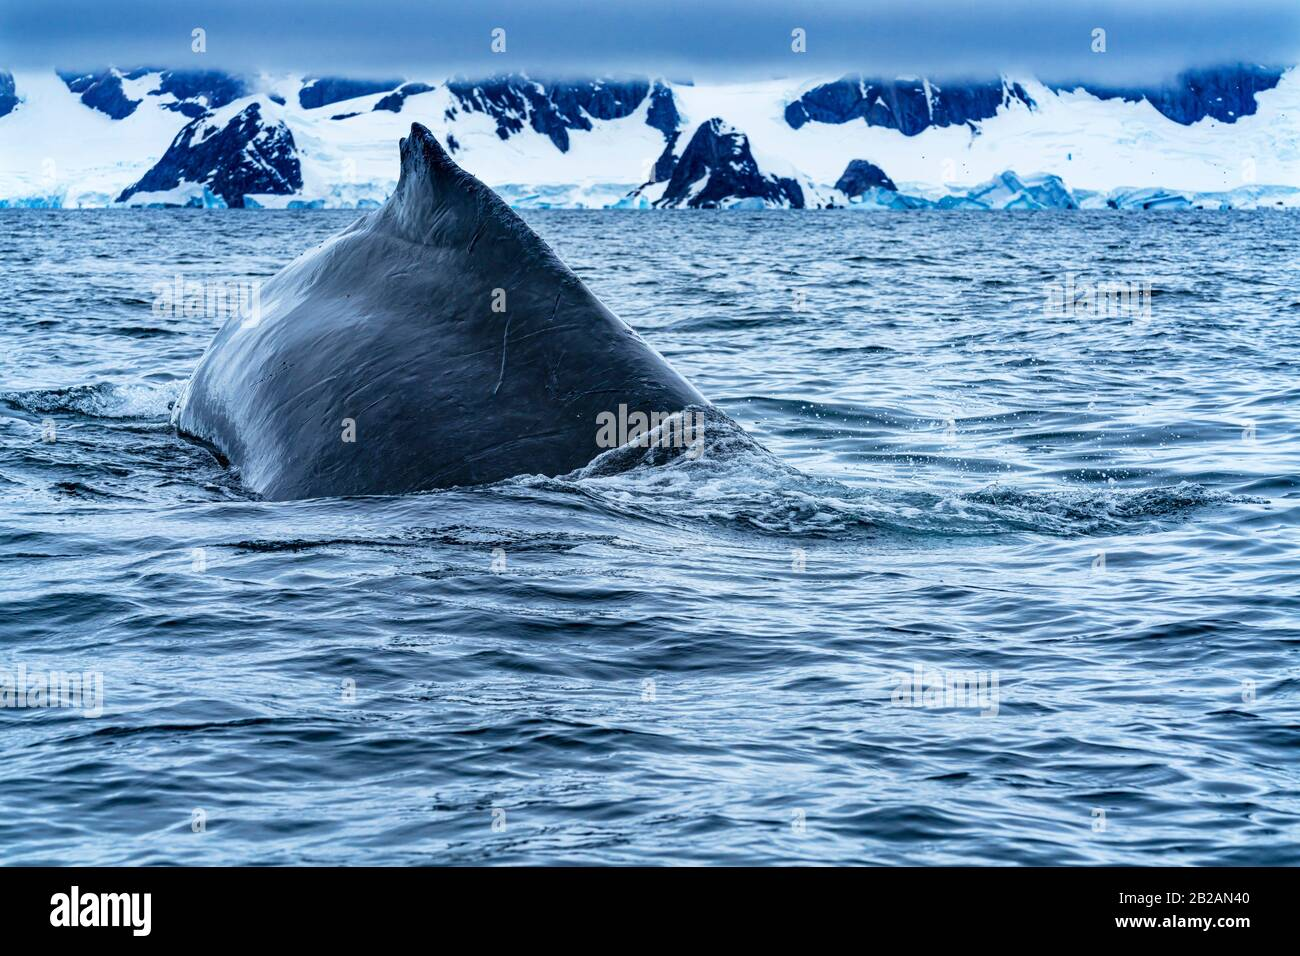 Humback Baleen Whale Chasing Krill Bajo El Barco De Goma Charlotte Bay Antarctic Peninsula Antarctic. Foto de stock